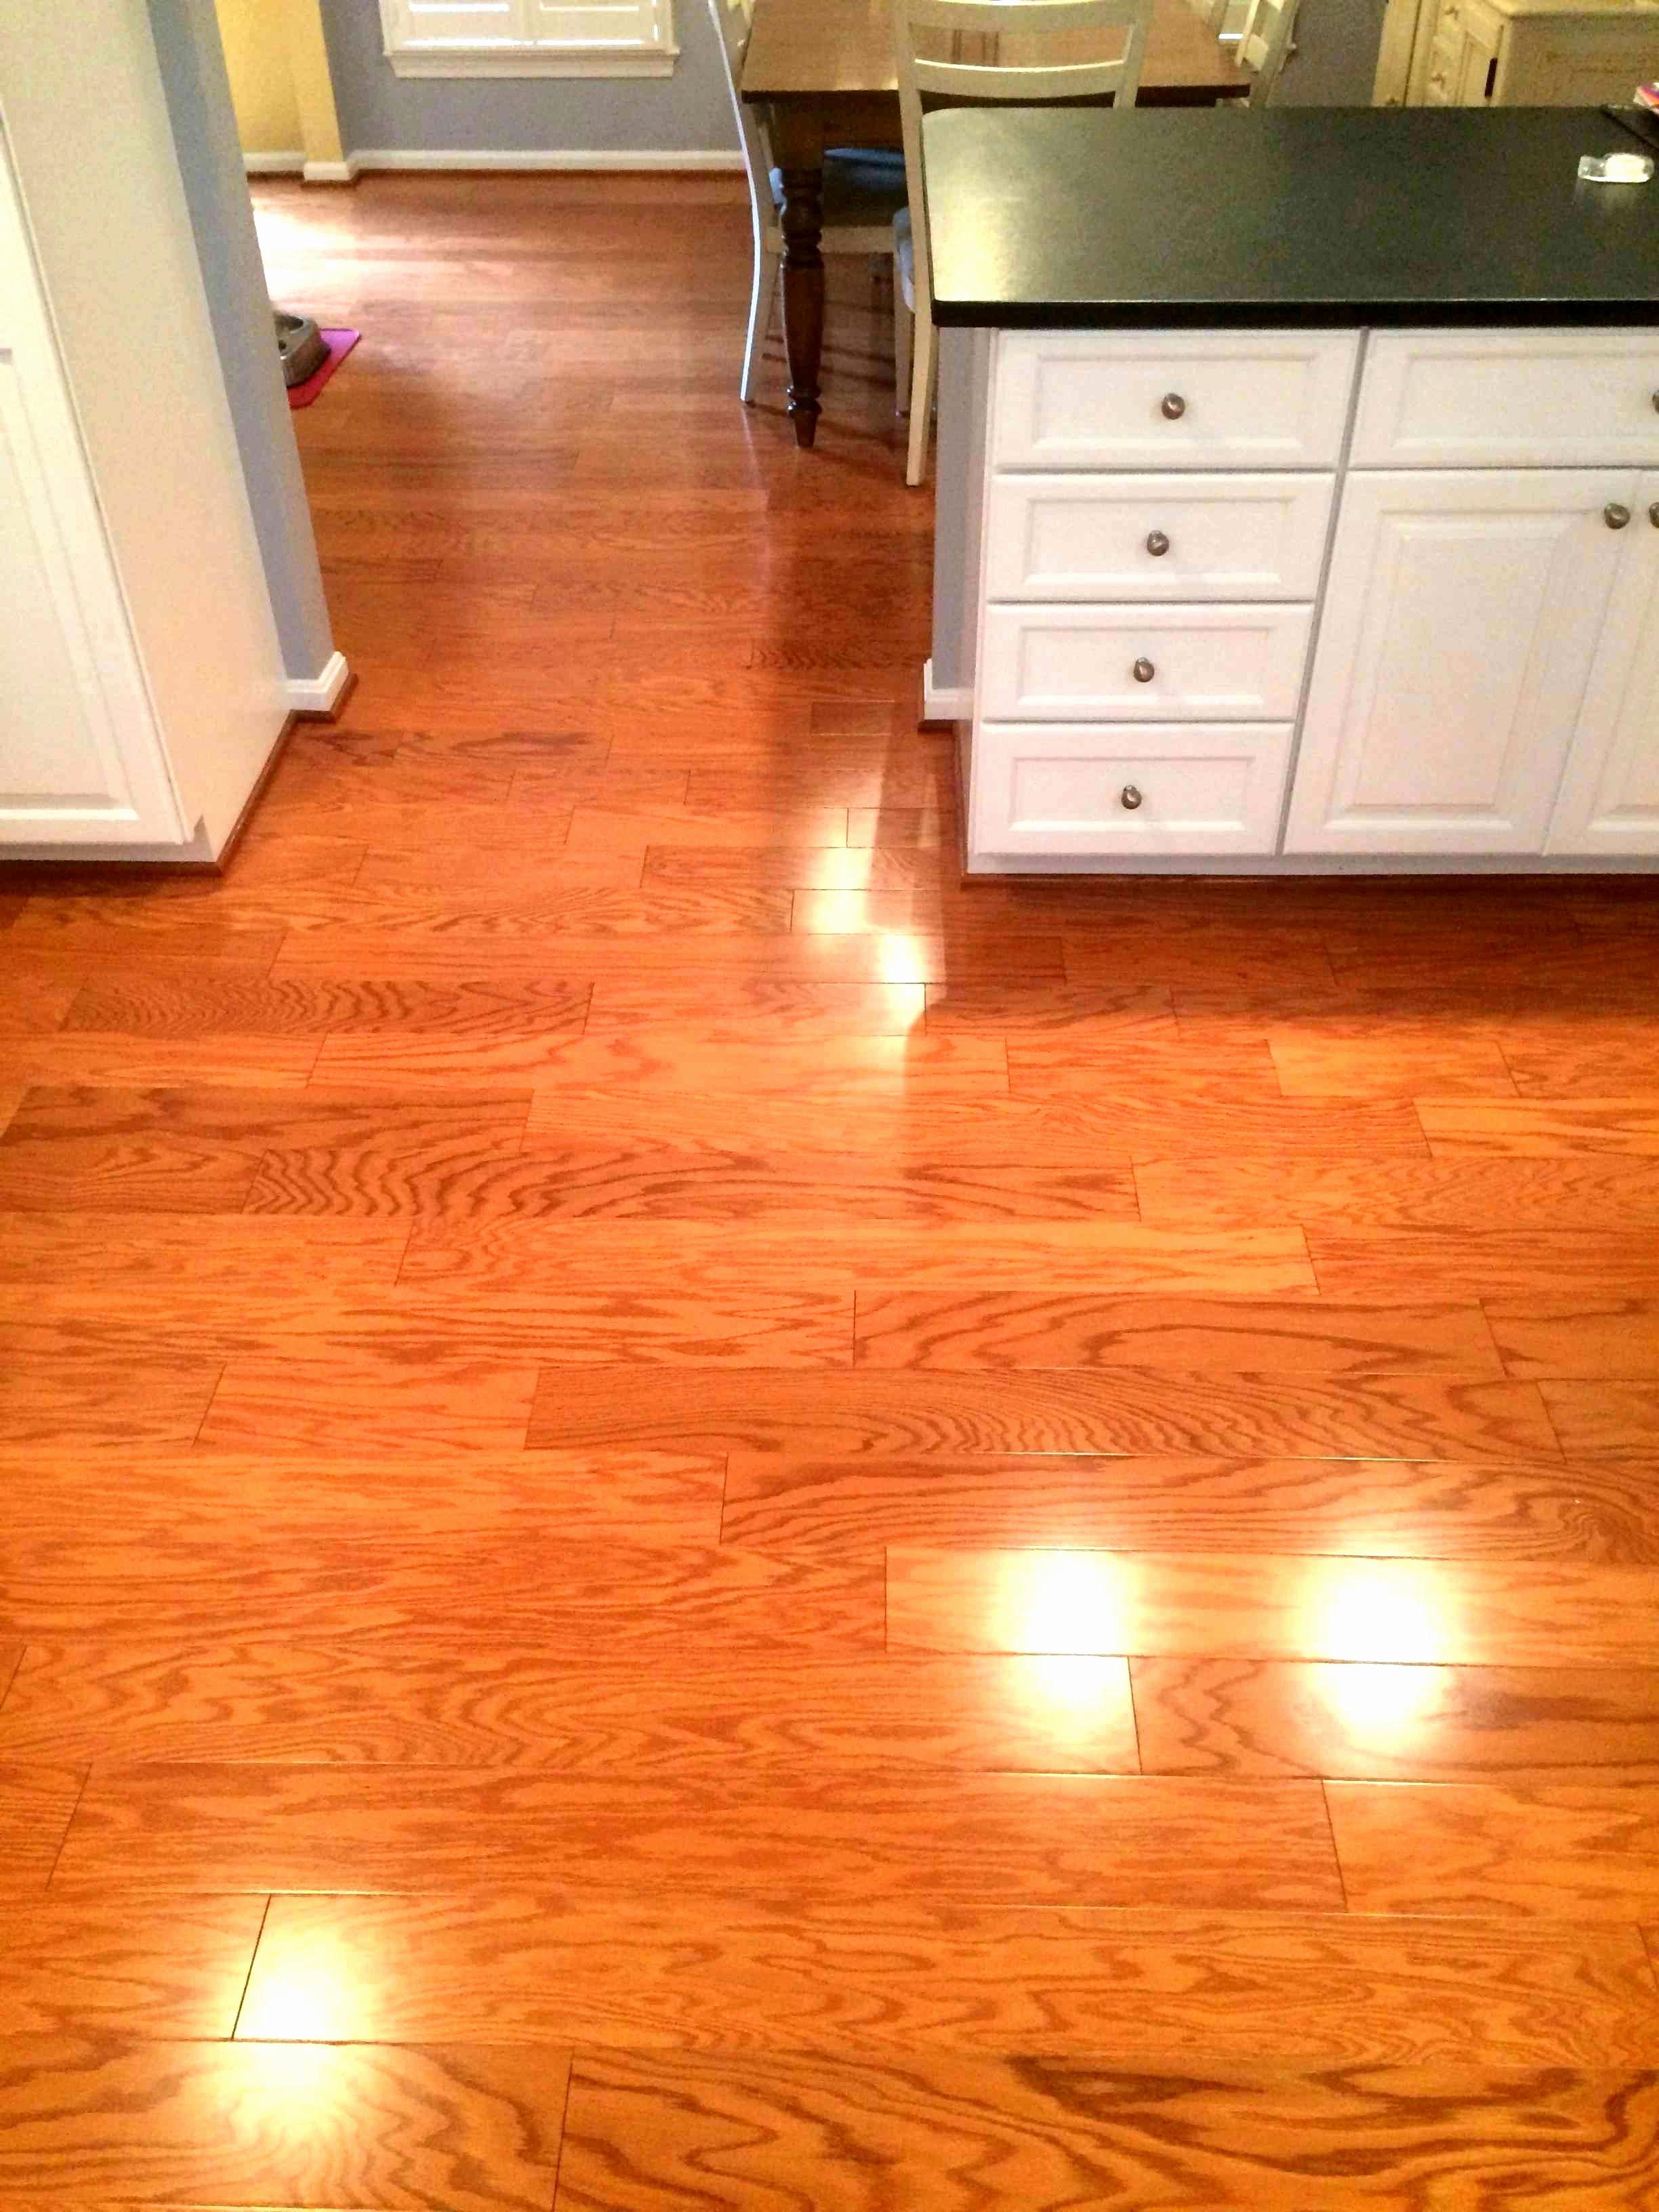 can you clean hardwood floors with vinegar of hardwood floor care floor plan ideas regarding hardwood floor care 50 fresh what is the best cleaner for hardwood floors pics 50